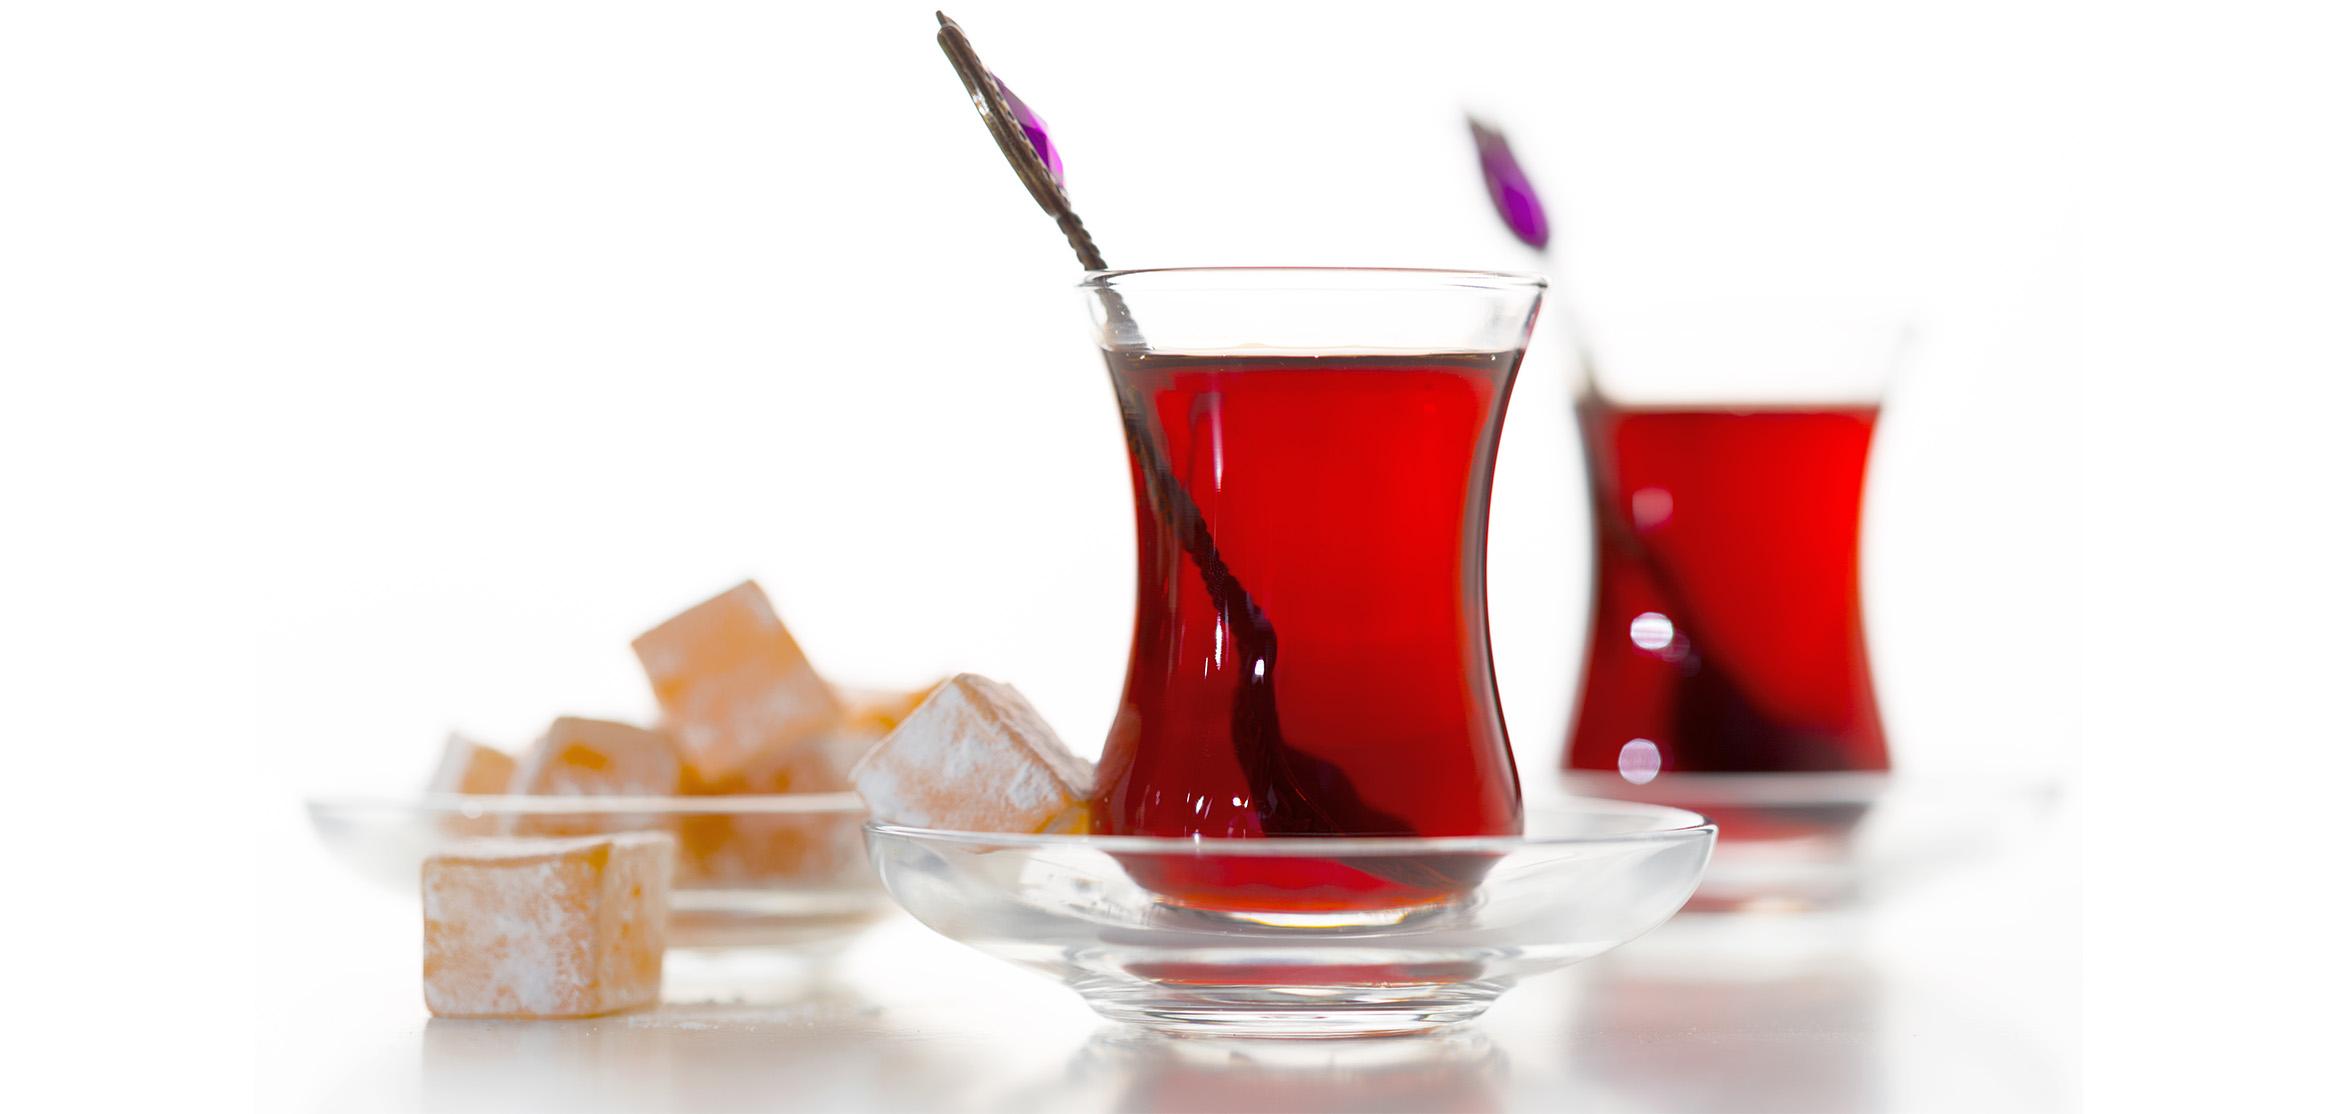 Health benefits of Turkish tea